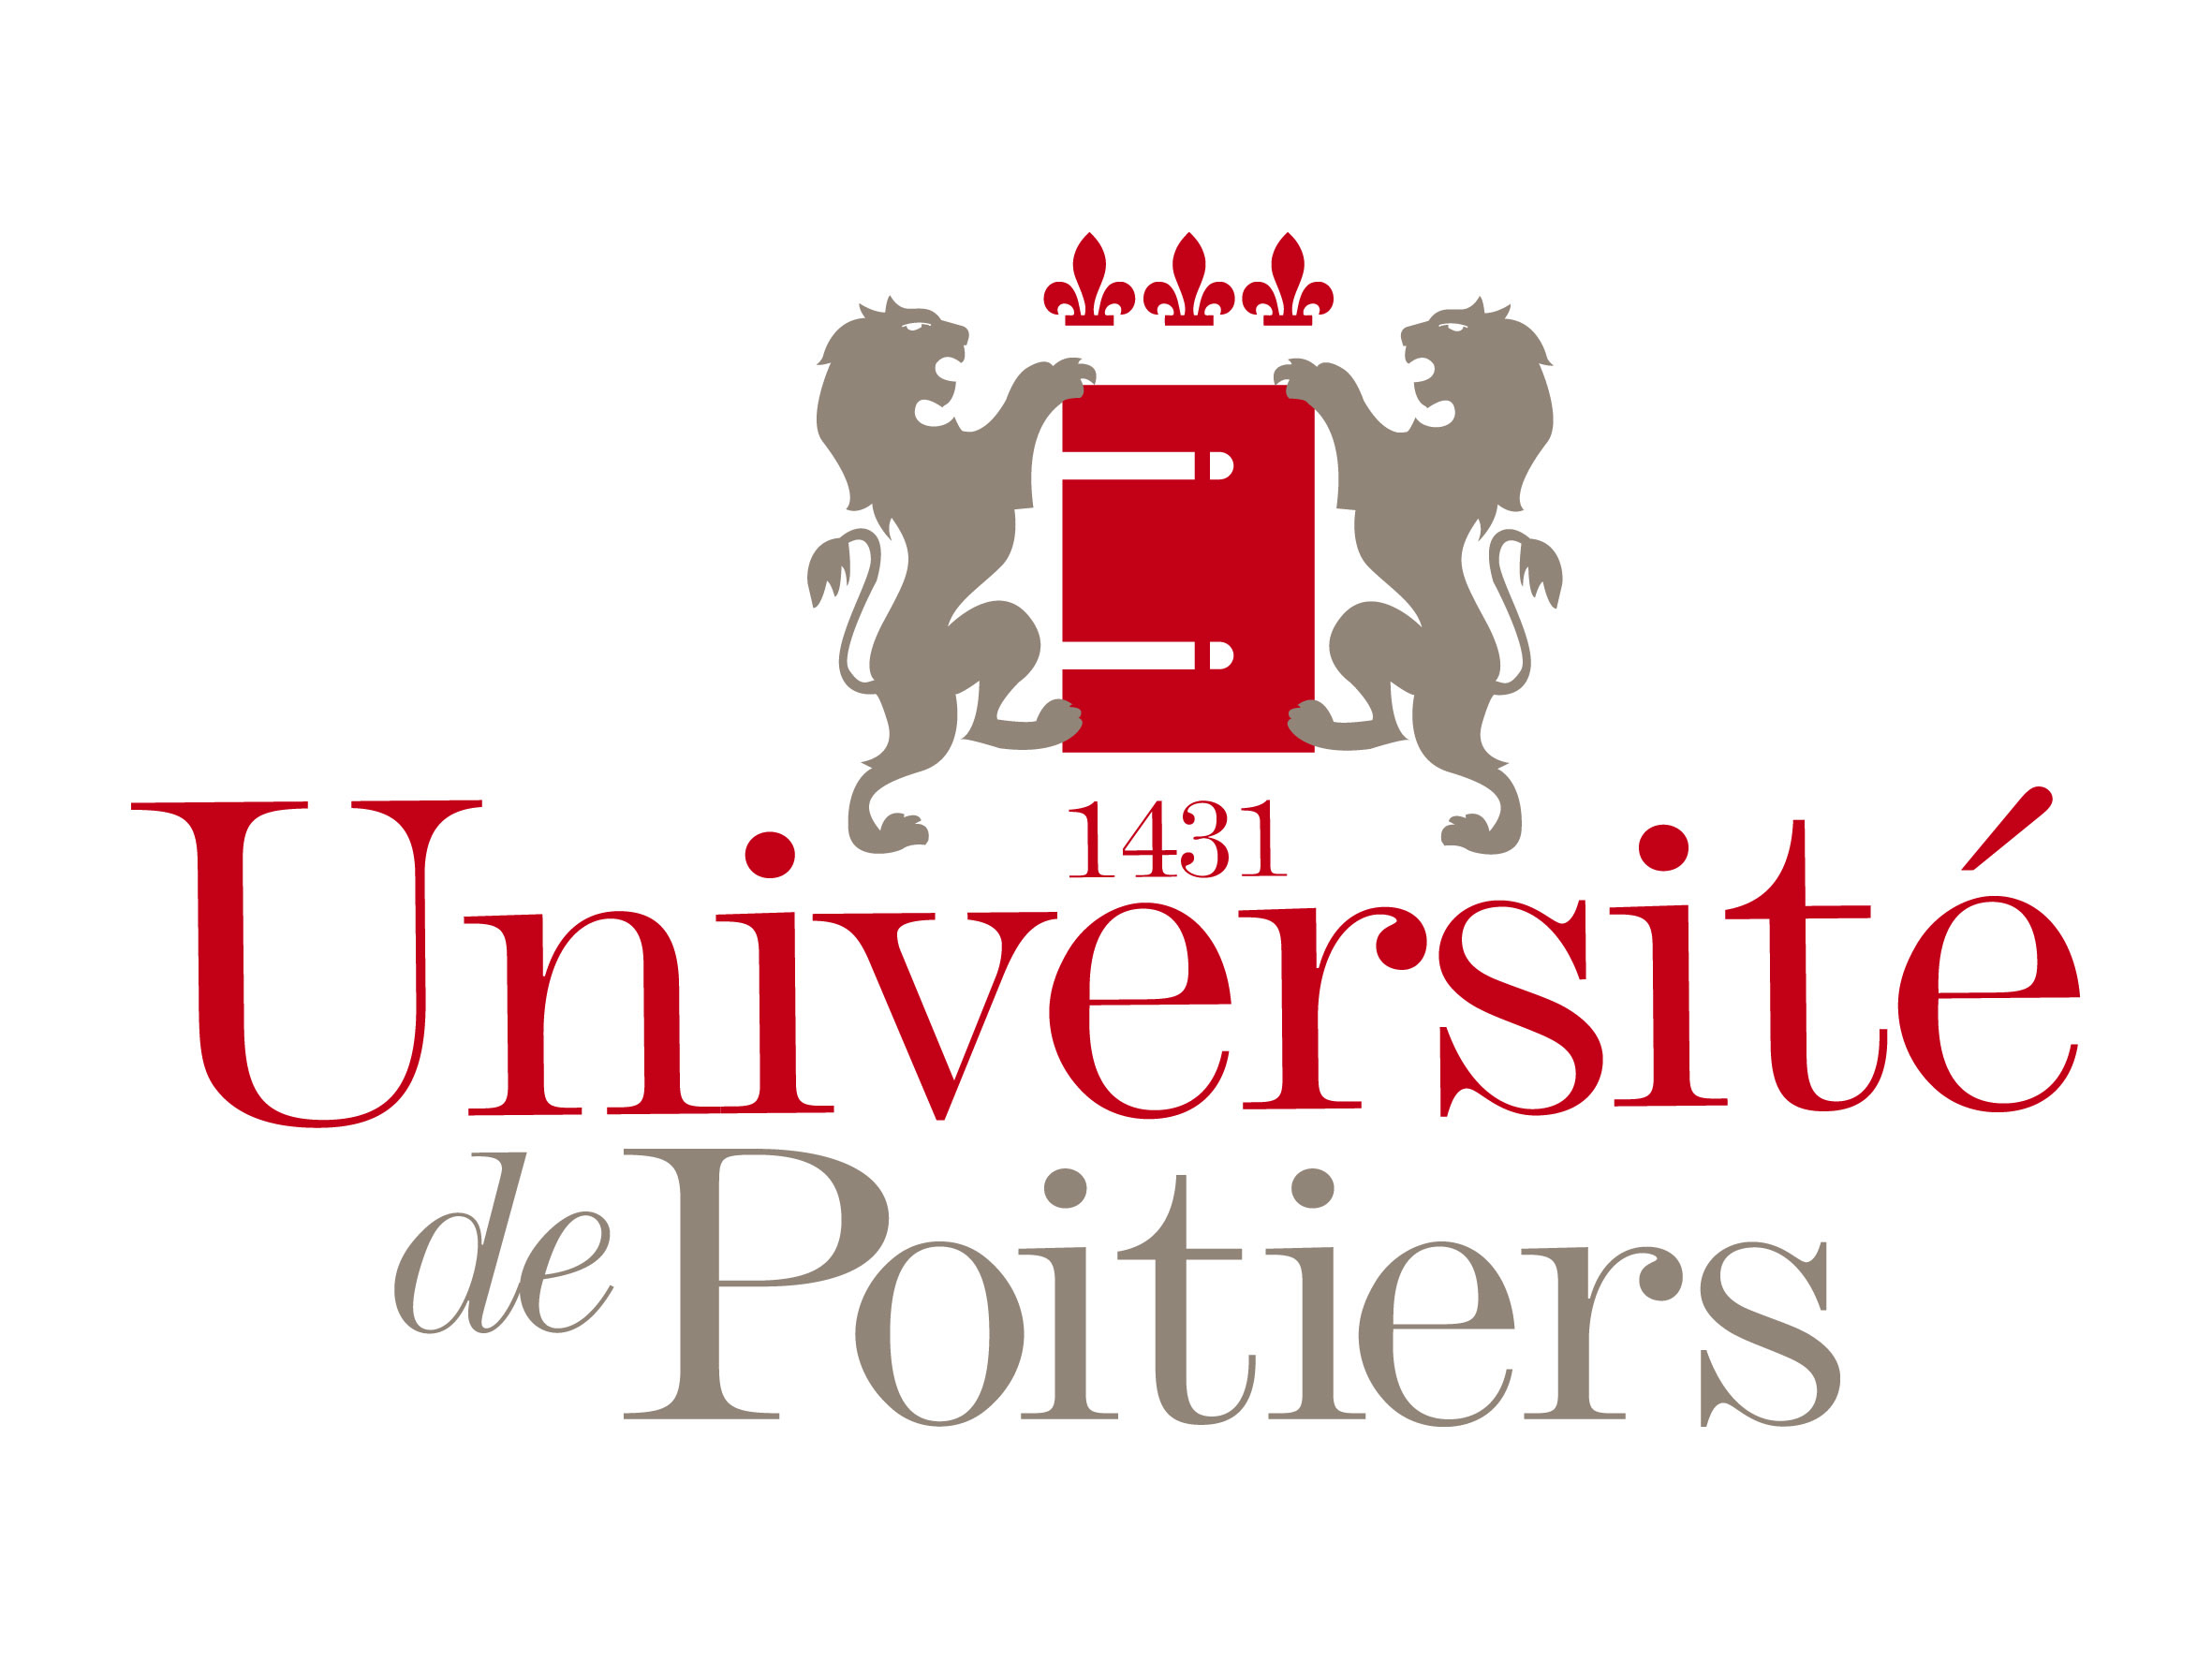 poitiers_universite_logo2011.jpg